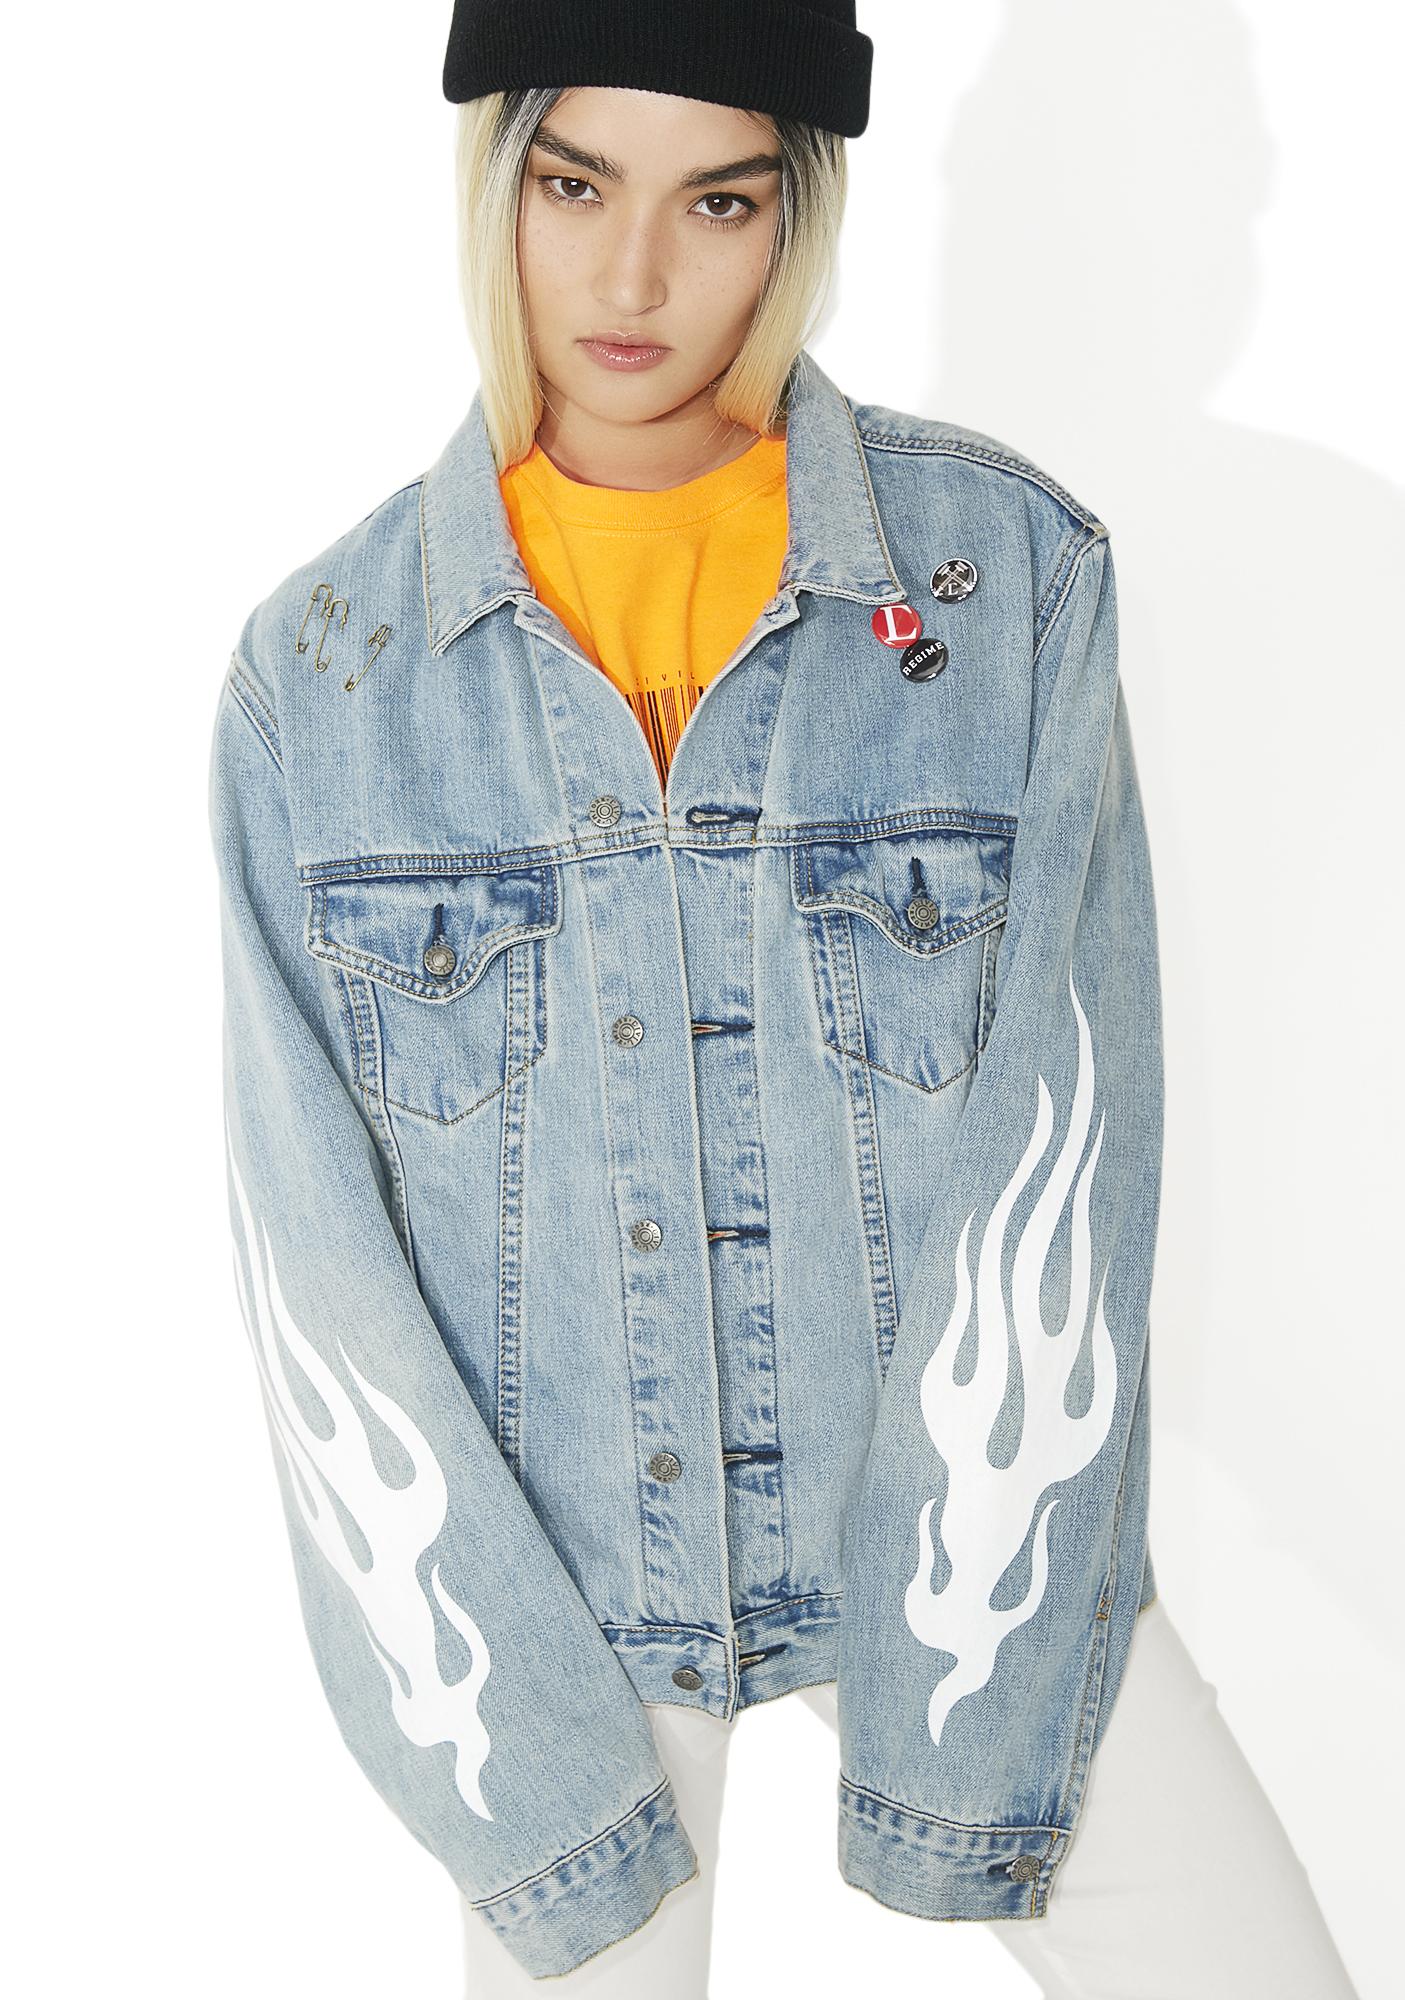 Civil Clothing Girl Code Oversized Denim Jacket